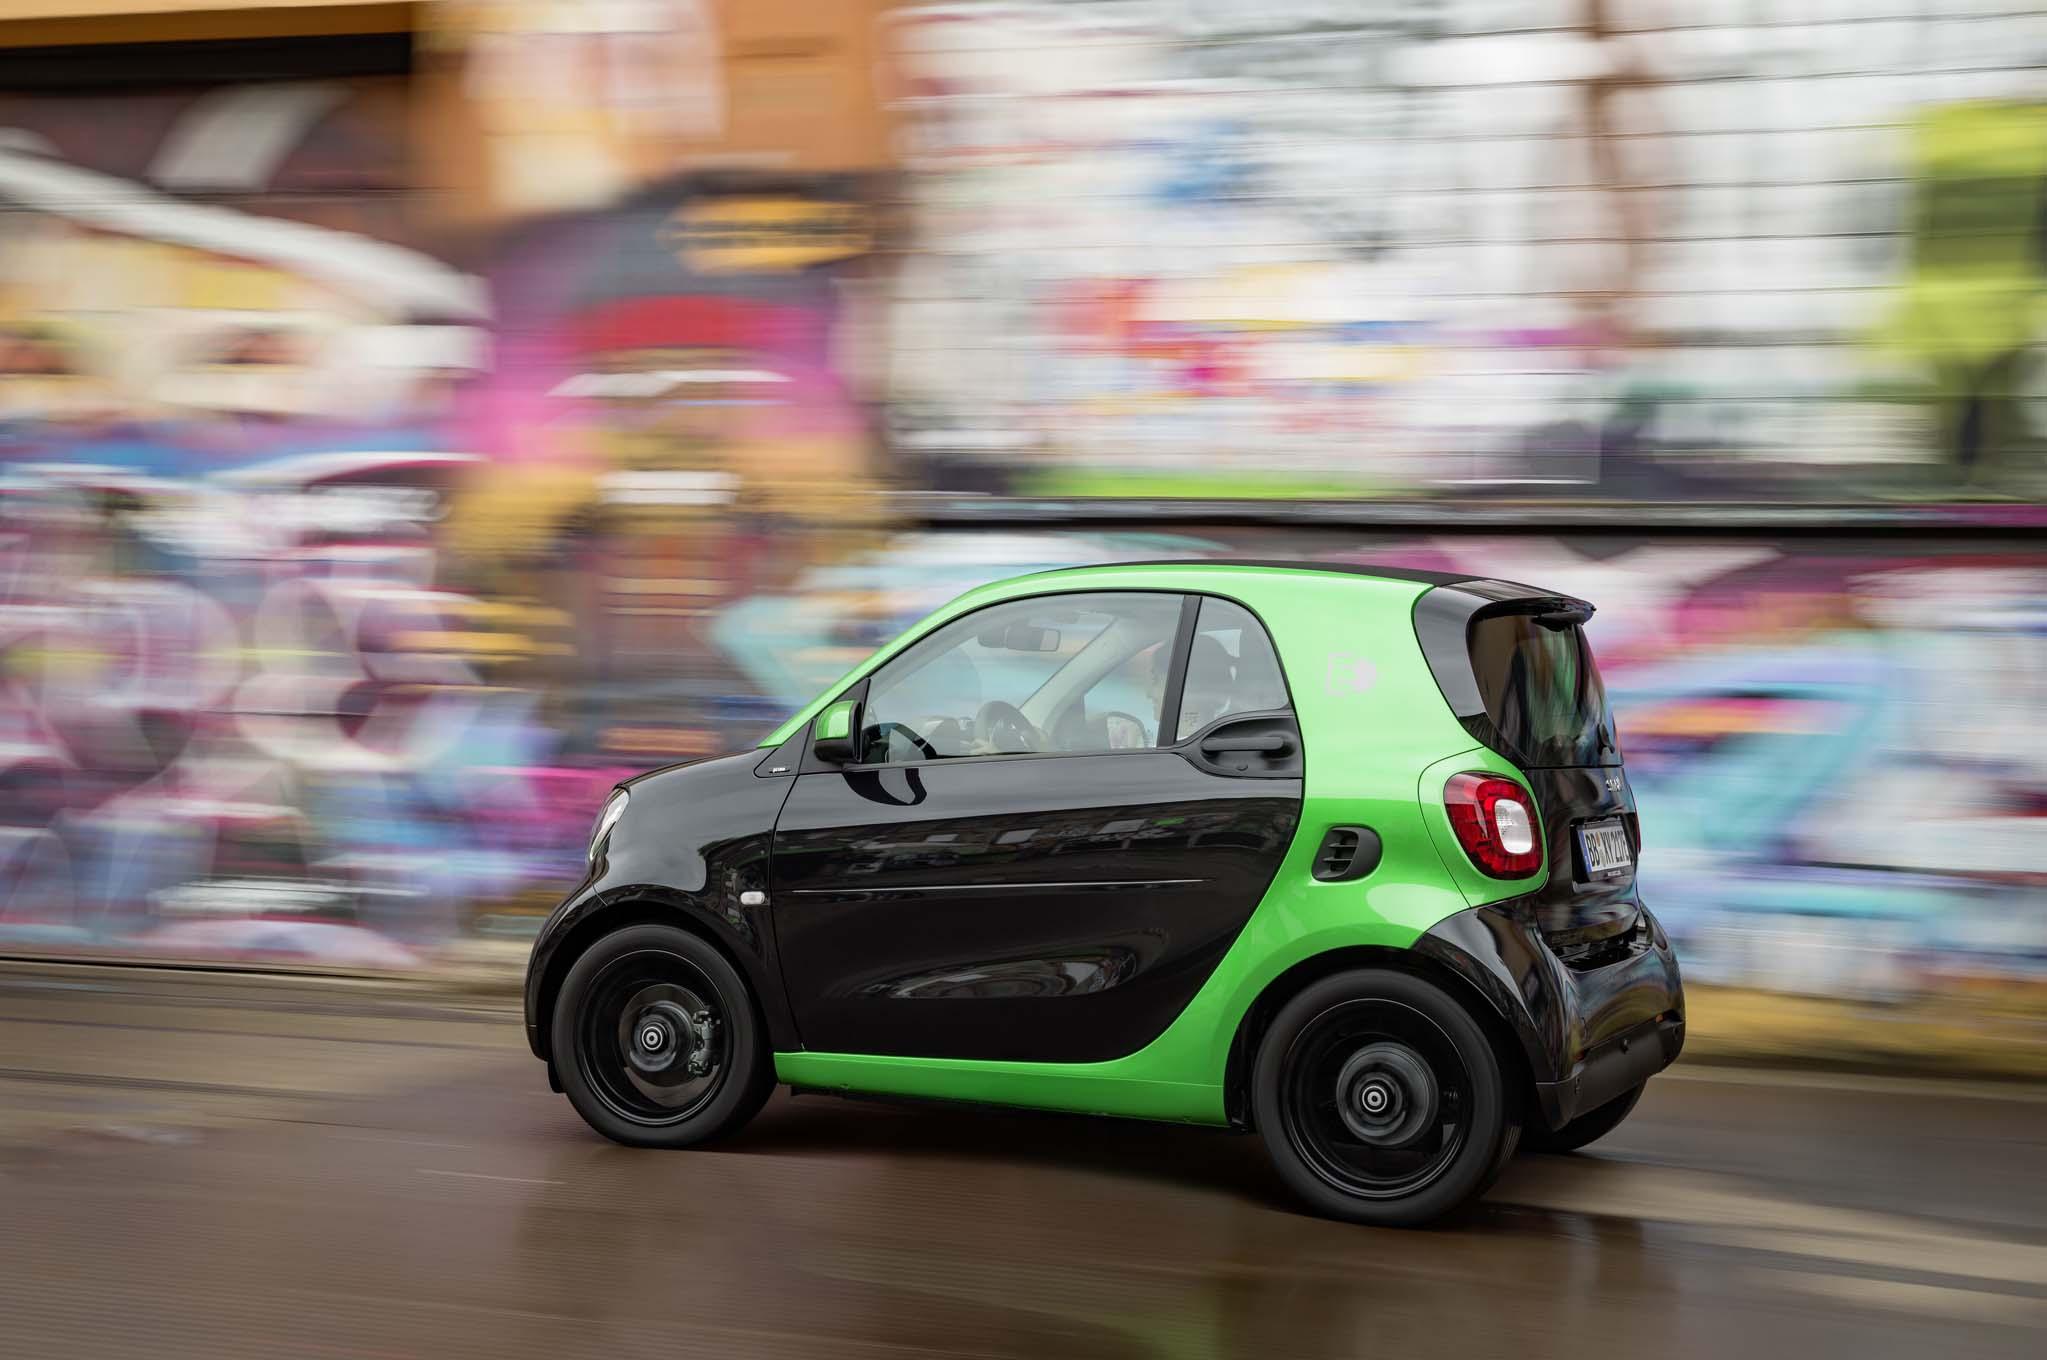 2017-Smart-Fortwo-Electric-side-rear-side-in-motion-02-1